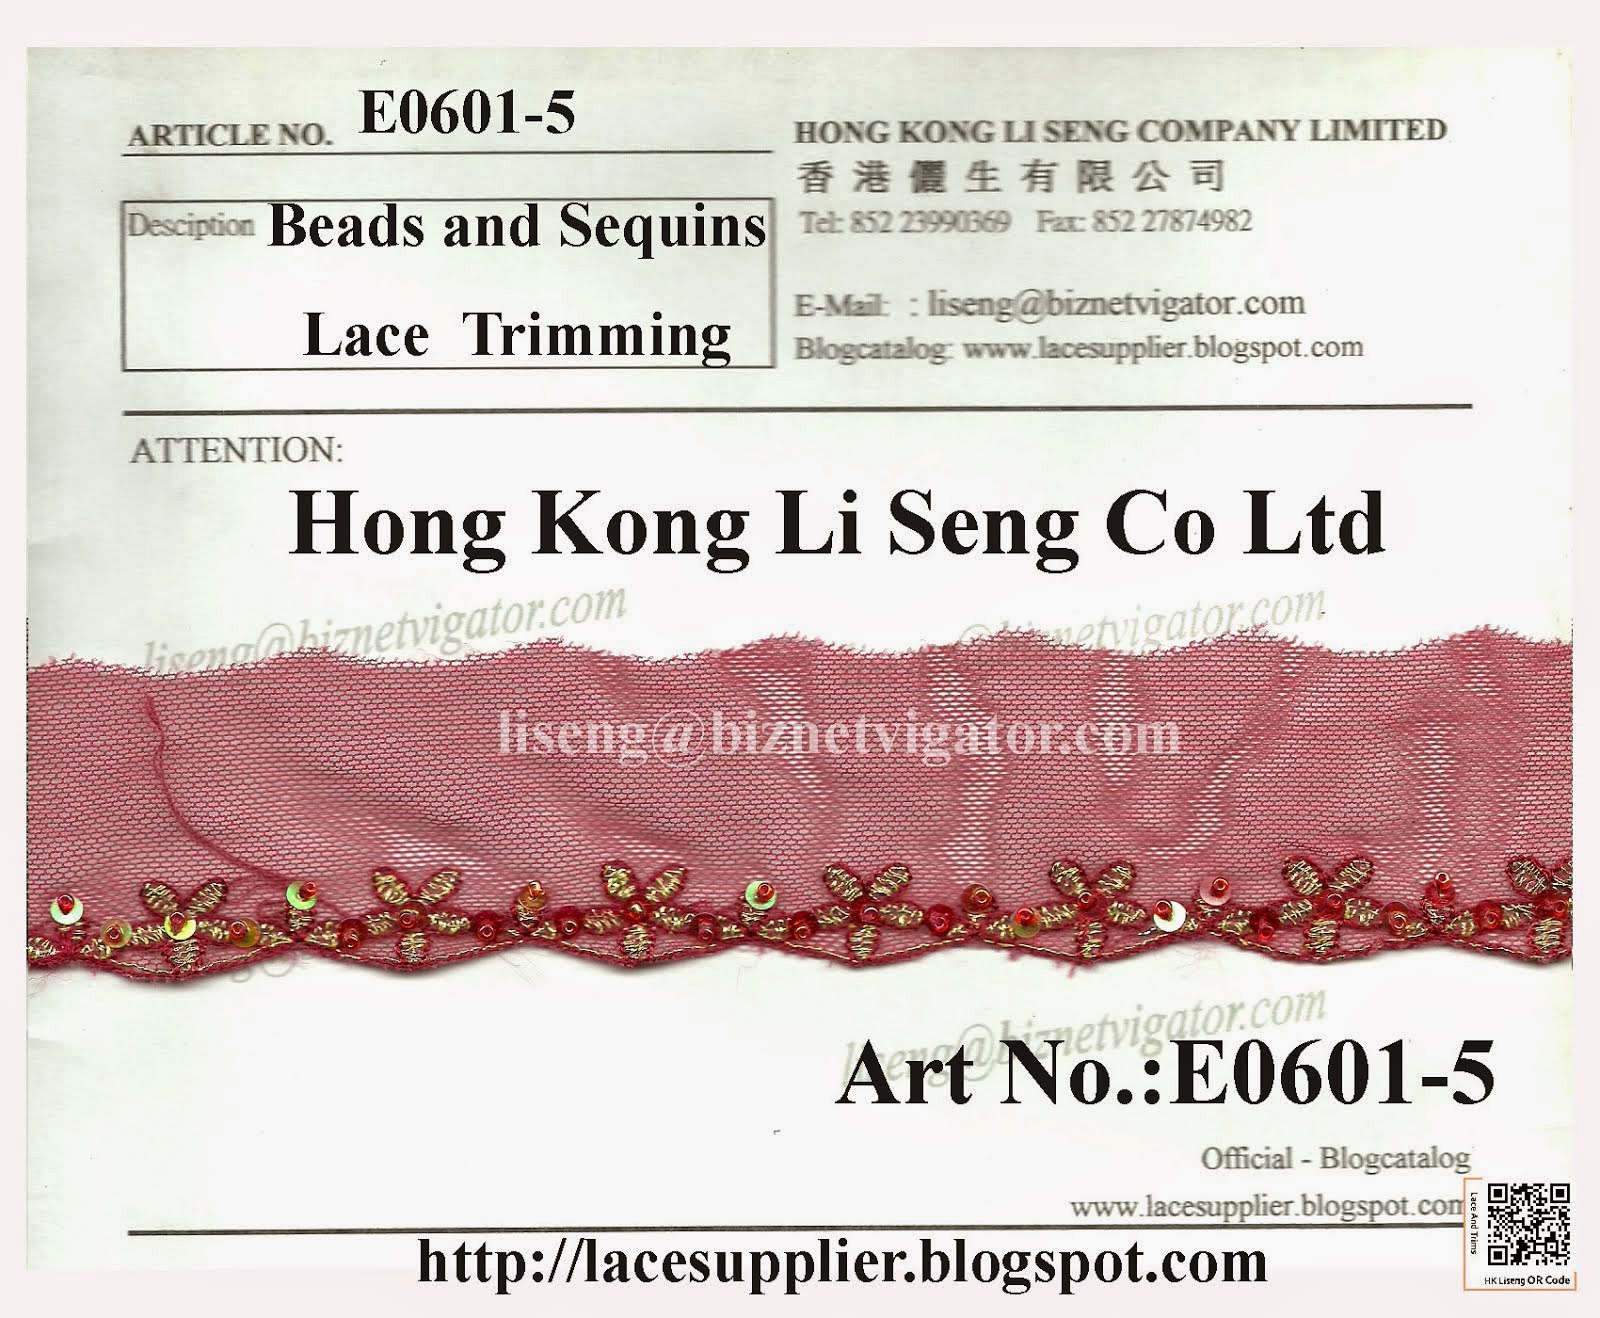 Beads and Sequins Lace Trims Factory - Hong Kong Li Seng Co Ltd